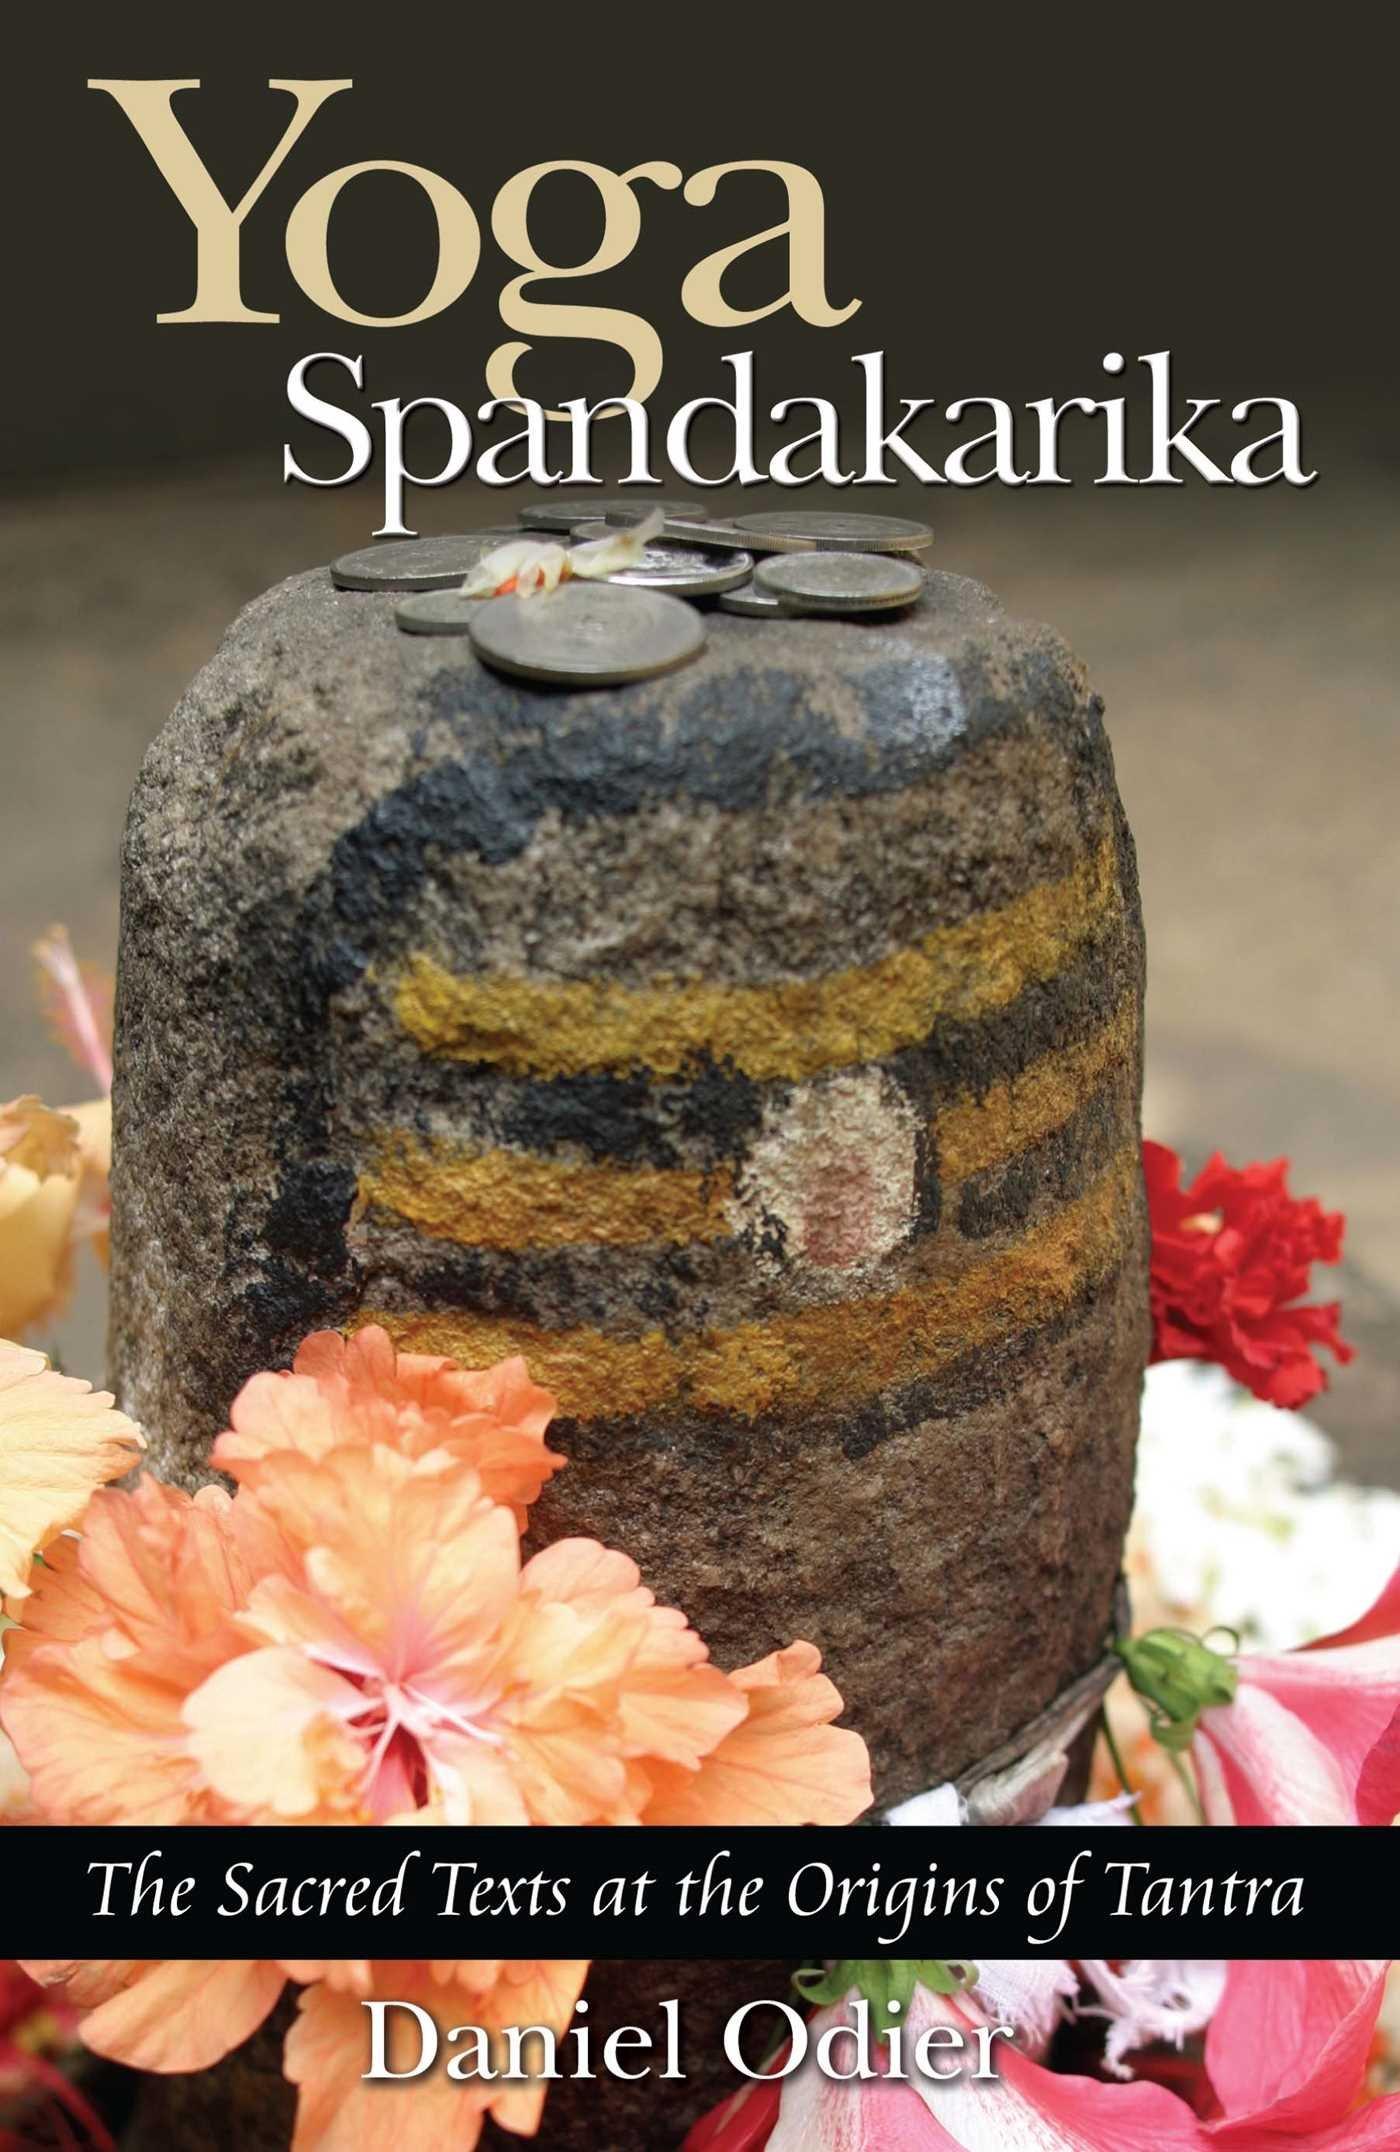 Yoga Spandakarika: The Sacred Texts at the Origins of Tantra pdf